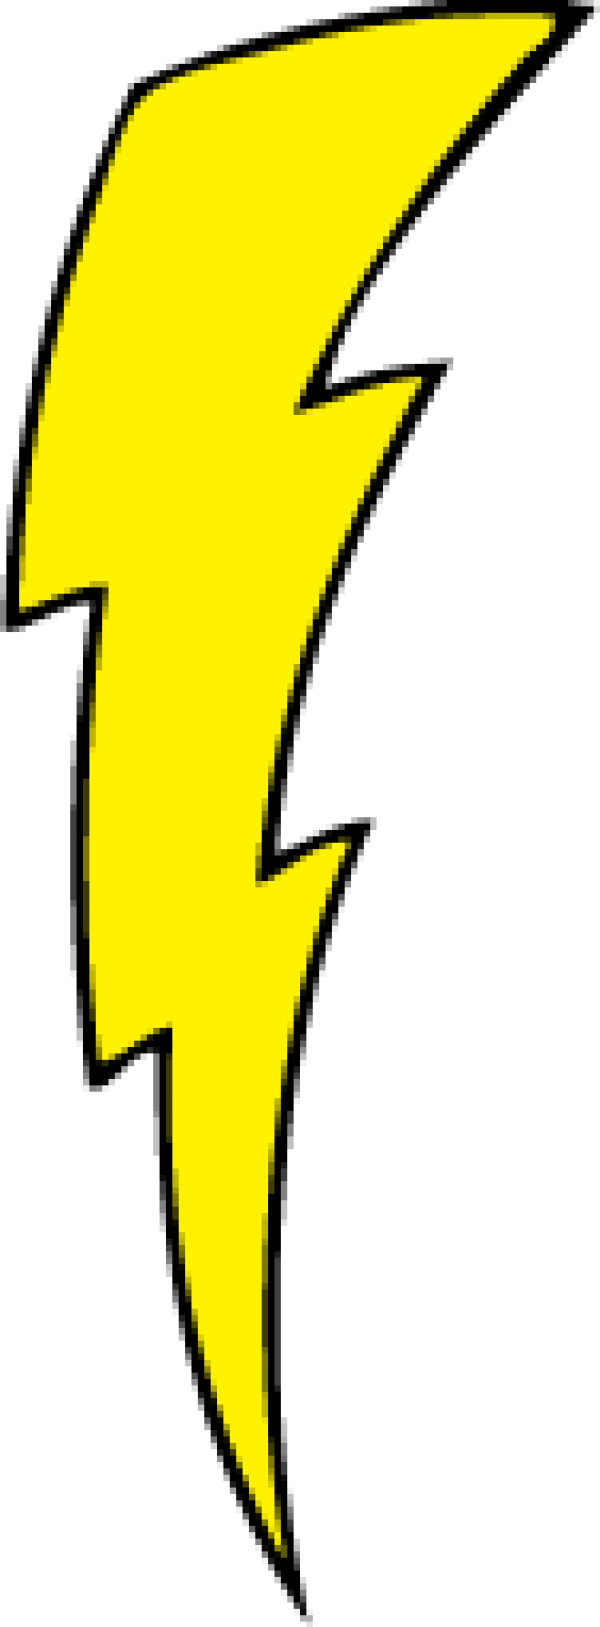 Lightning clipart lightning bolt. Yellow